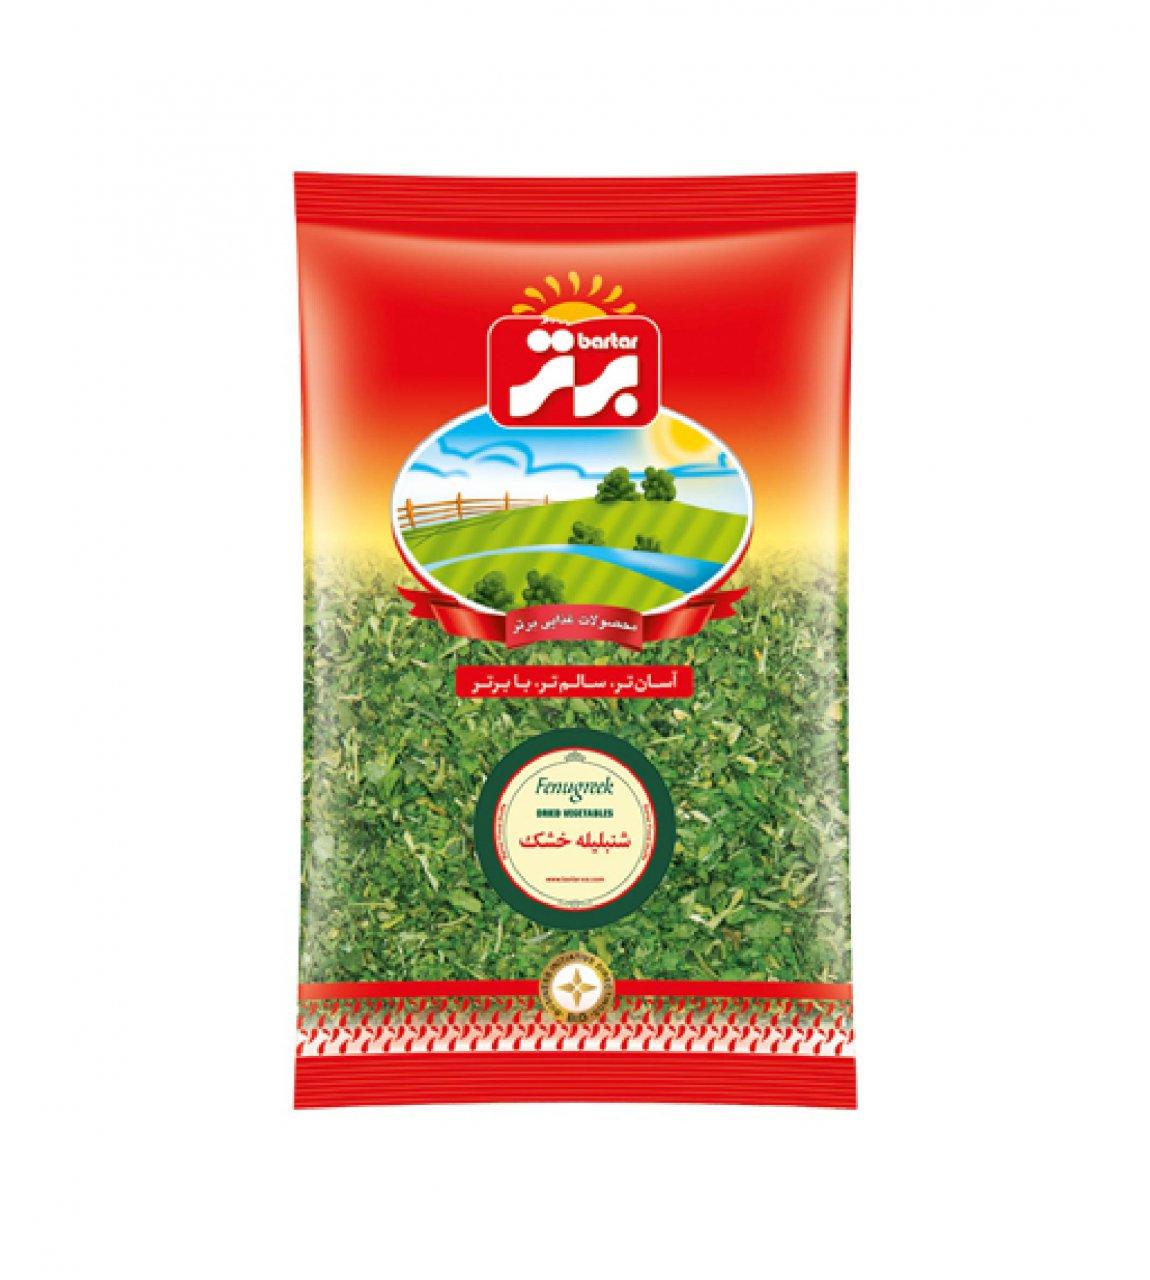 سبزی شنبلیله 70 گرم برتر